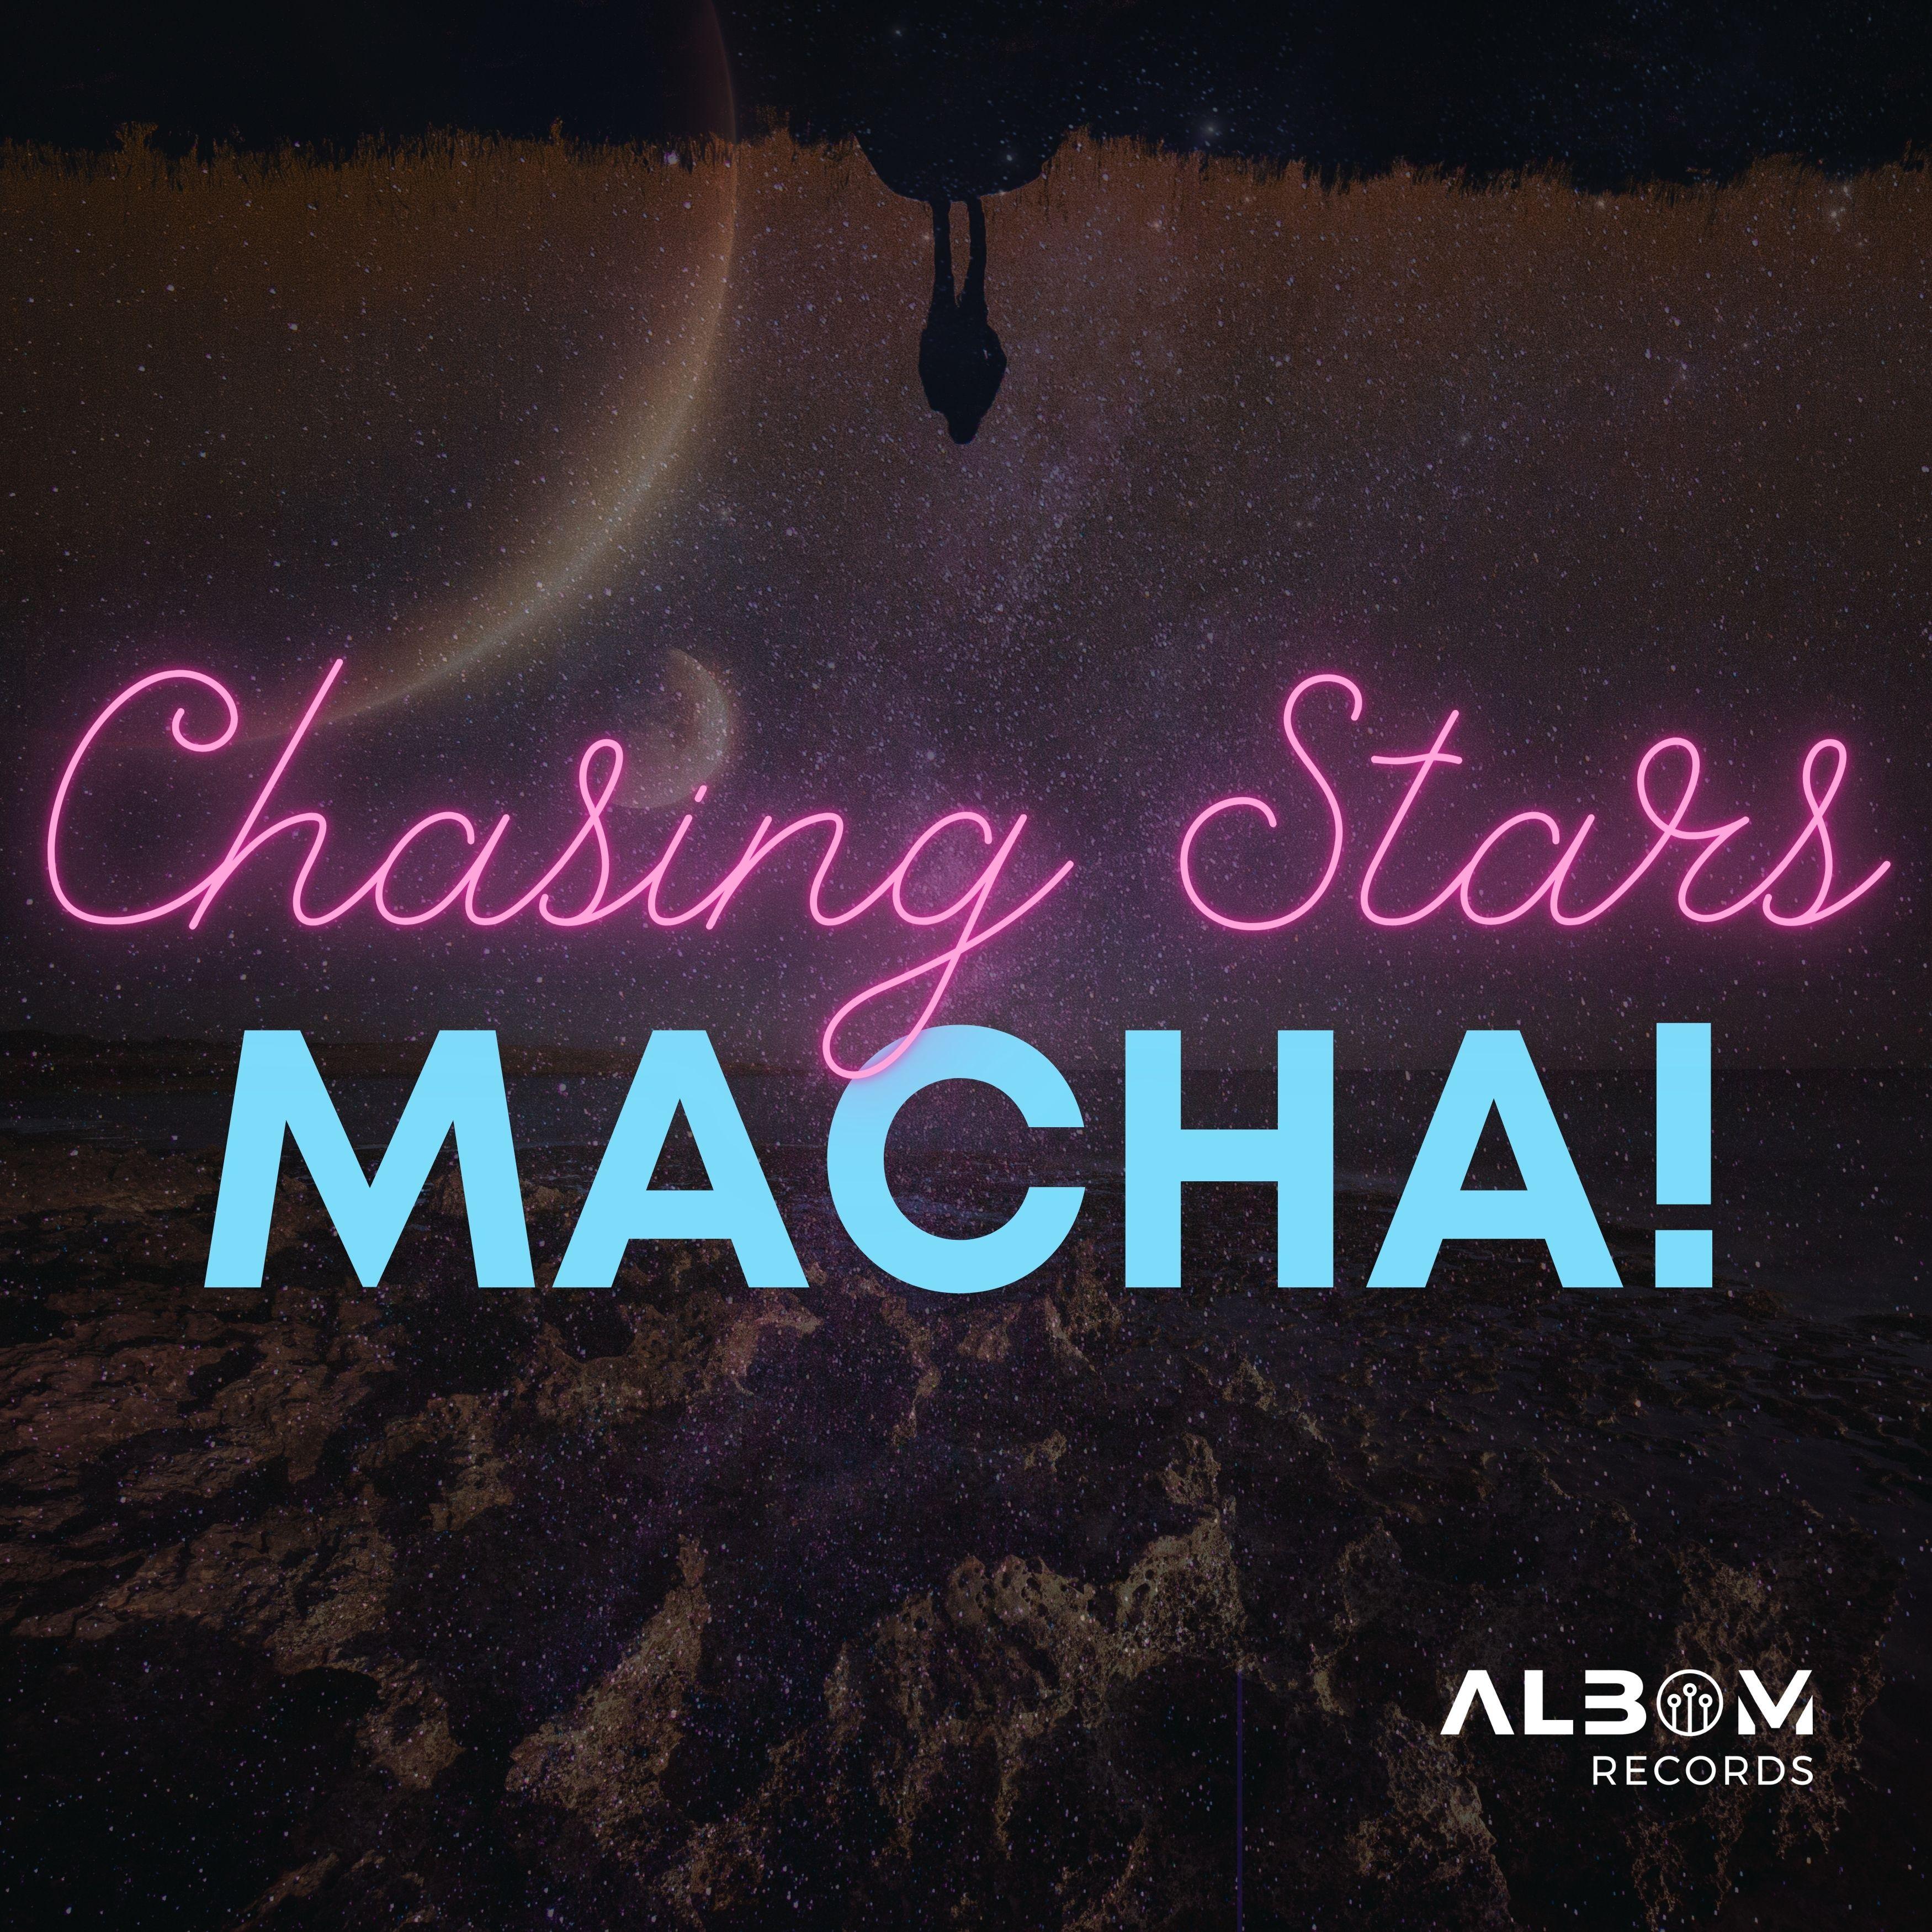 Chasing Stars Image